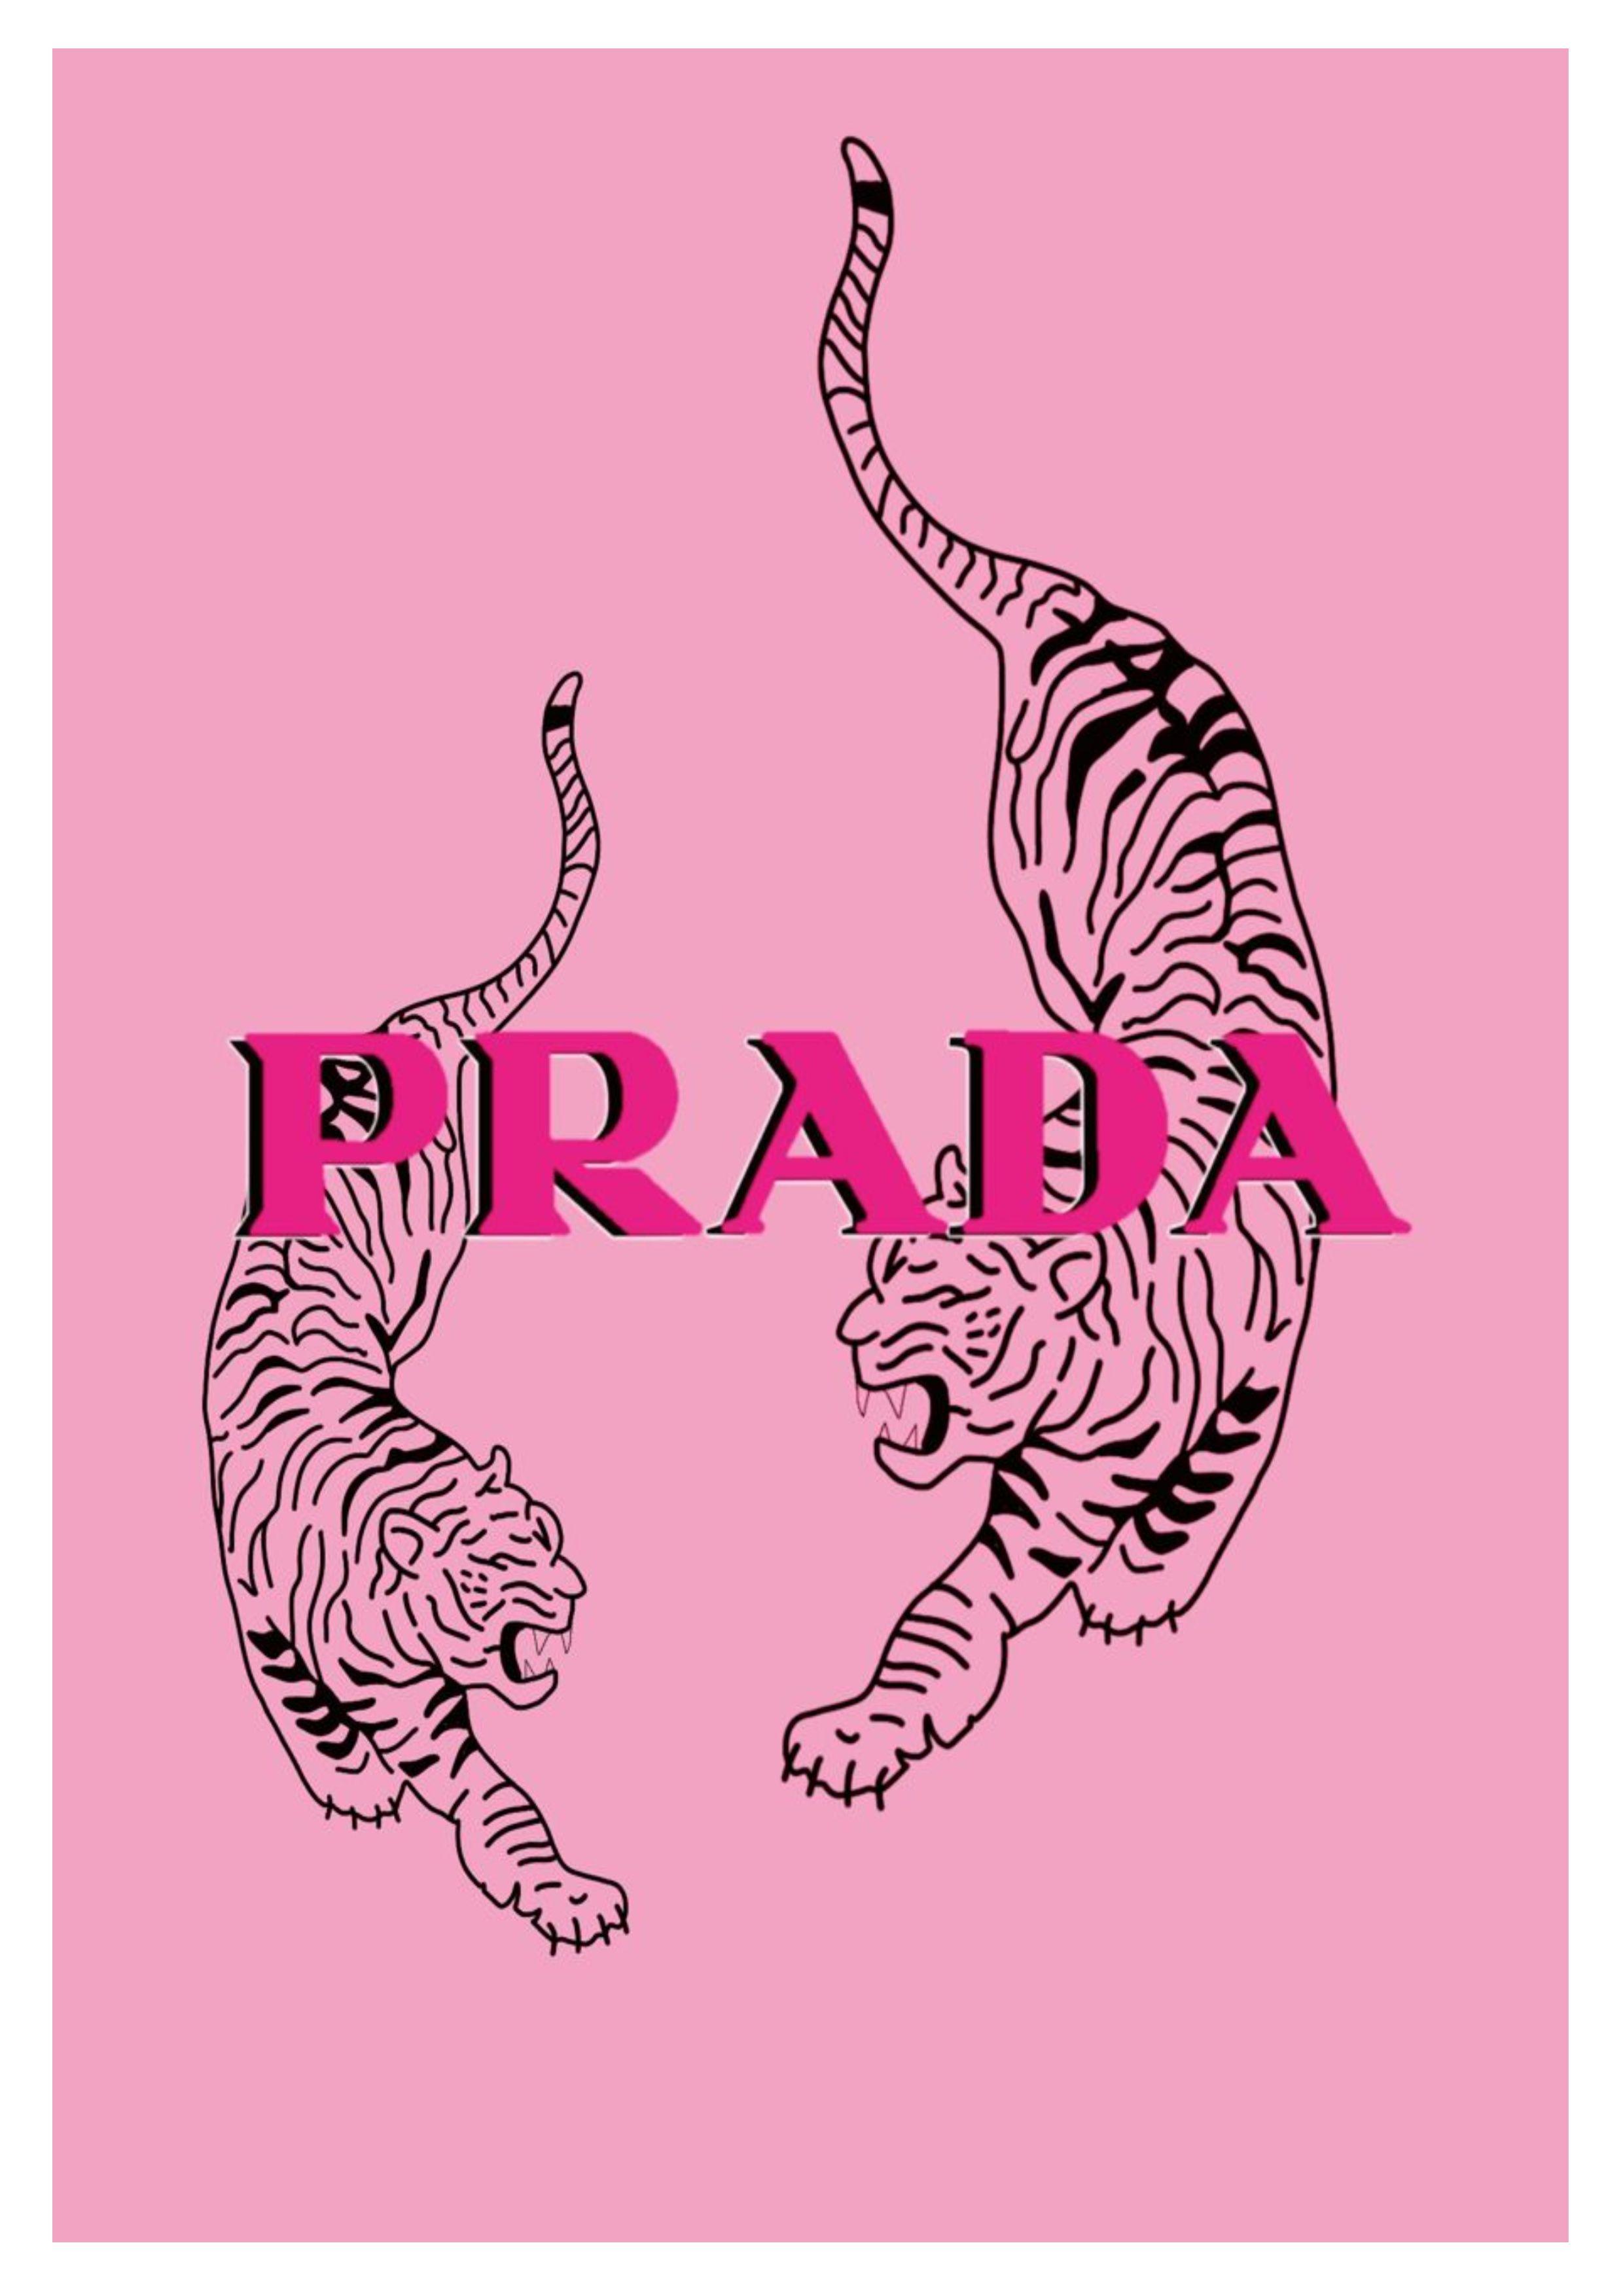 Prada Poster   A4/A5/DIGITAL   Vintage Prada Fashion Magazine Cover Art Print Tiger Animal Framed